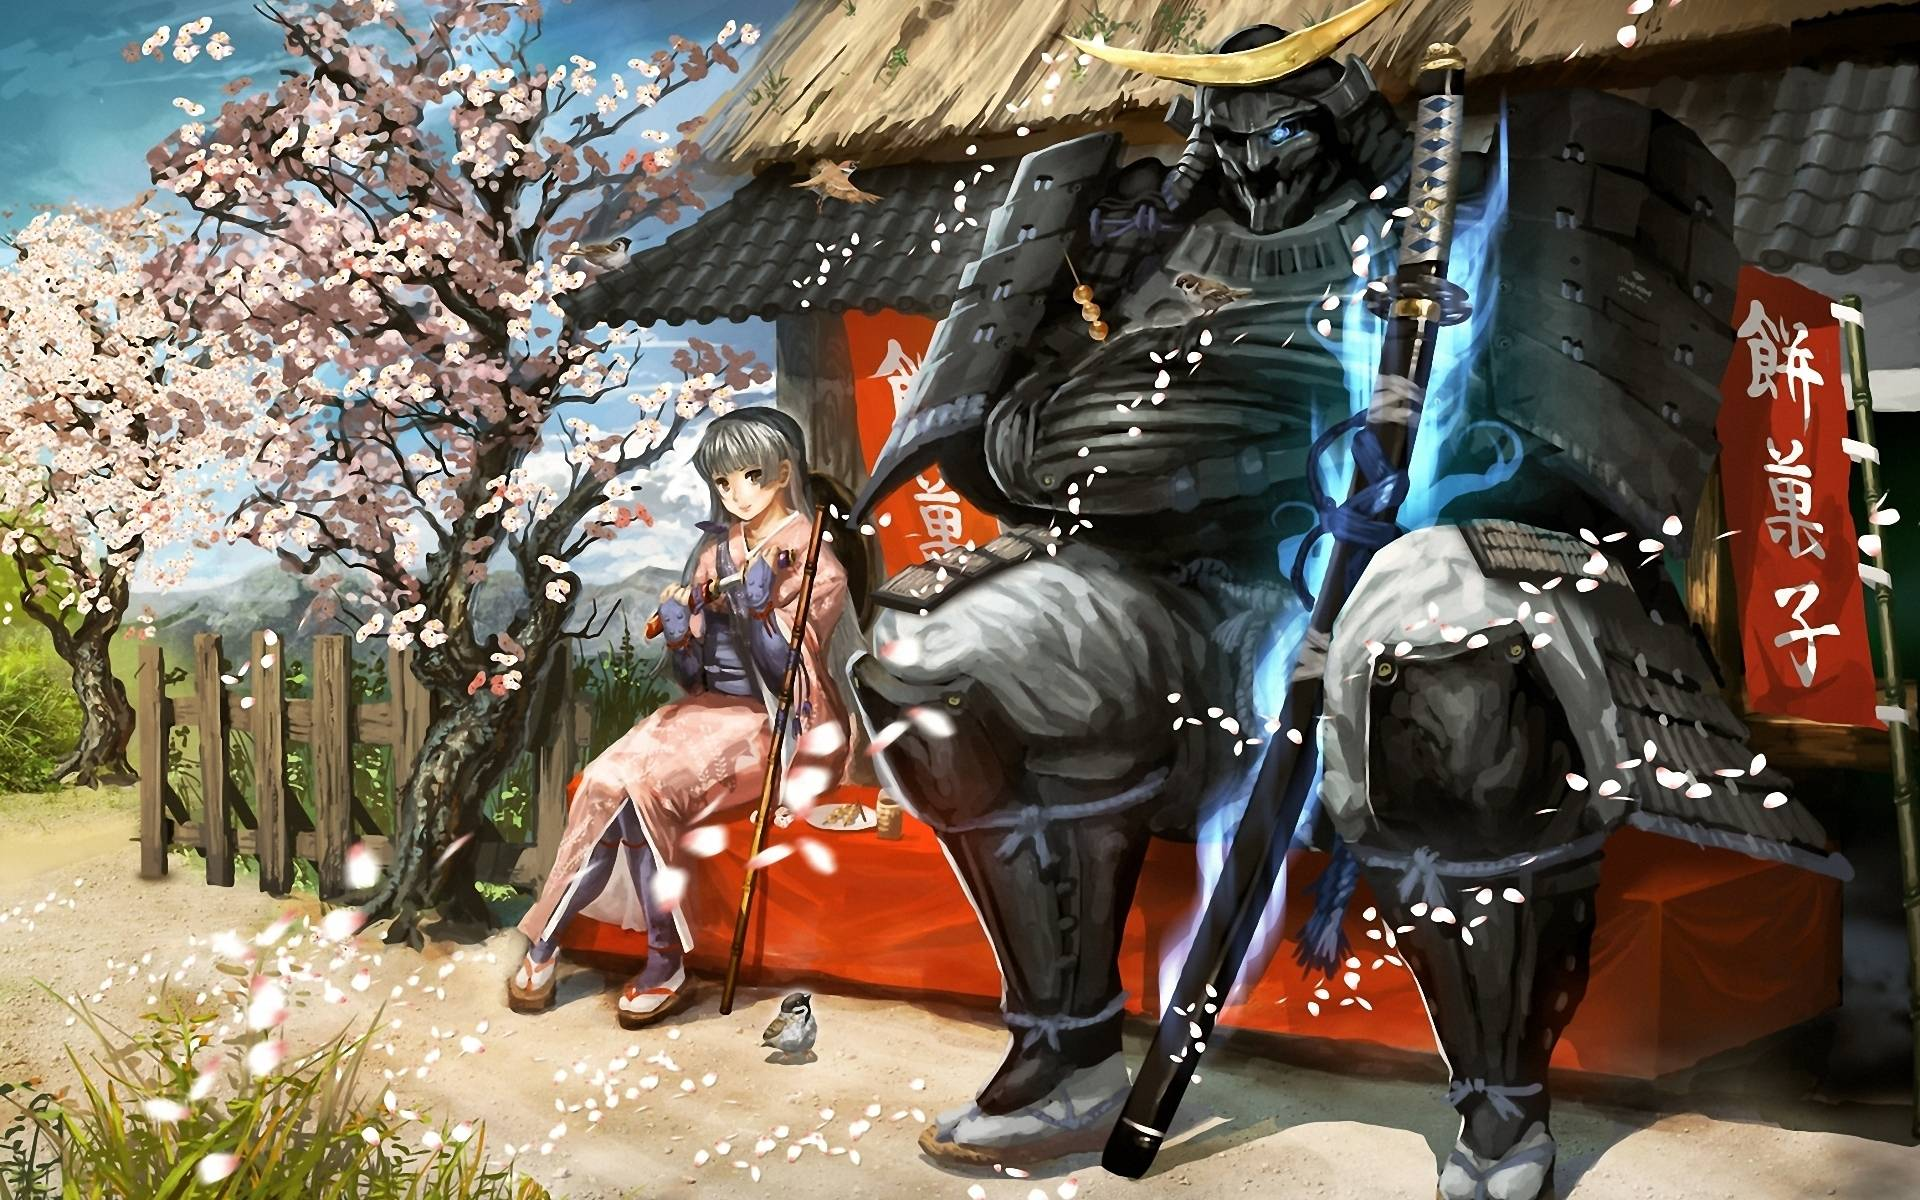 Anime Samurai Wallpapers Wallpaper Cave